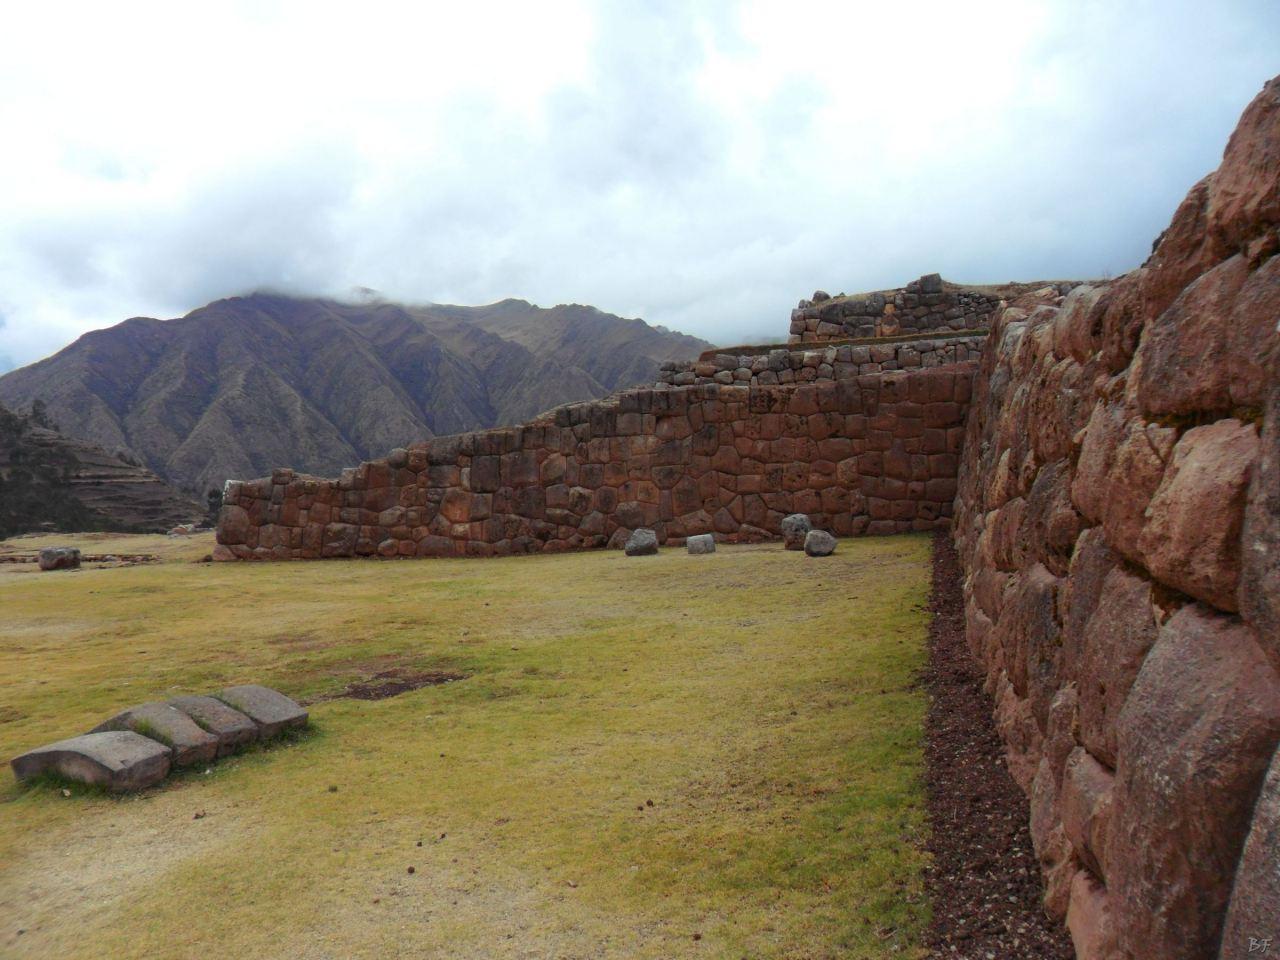 Chinchero-Mura-Poligonali-Piramide-Urubamba-Peru-38